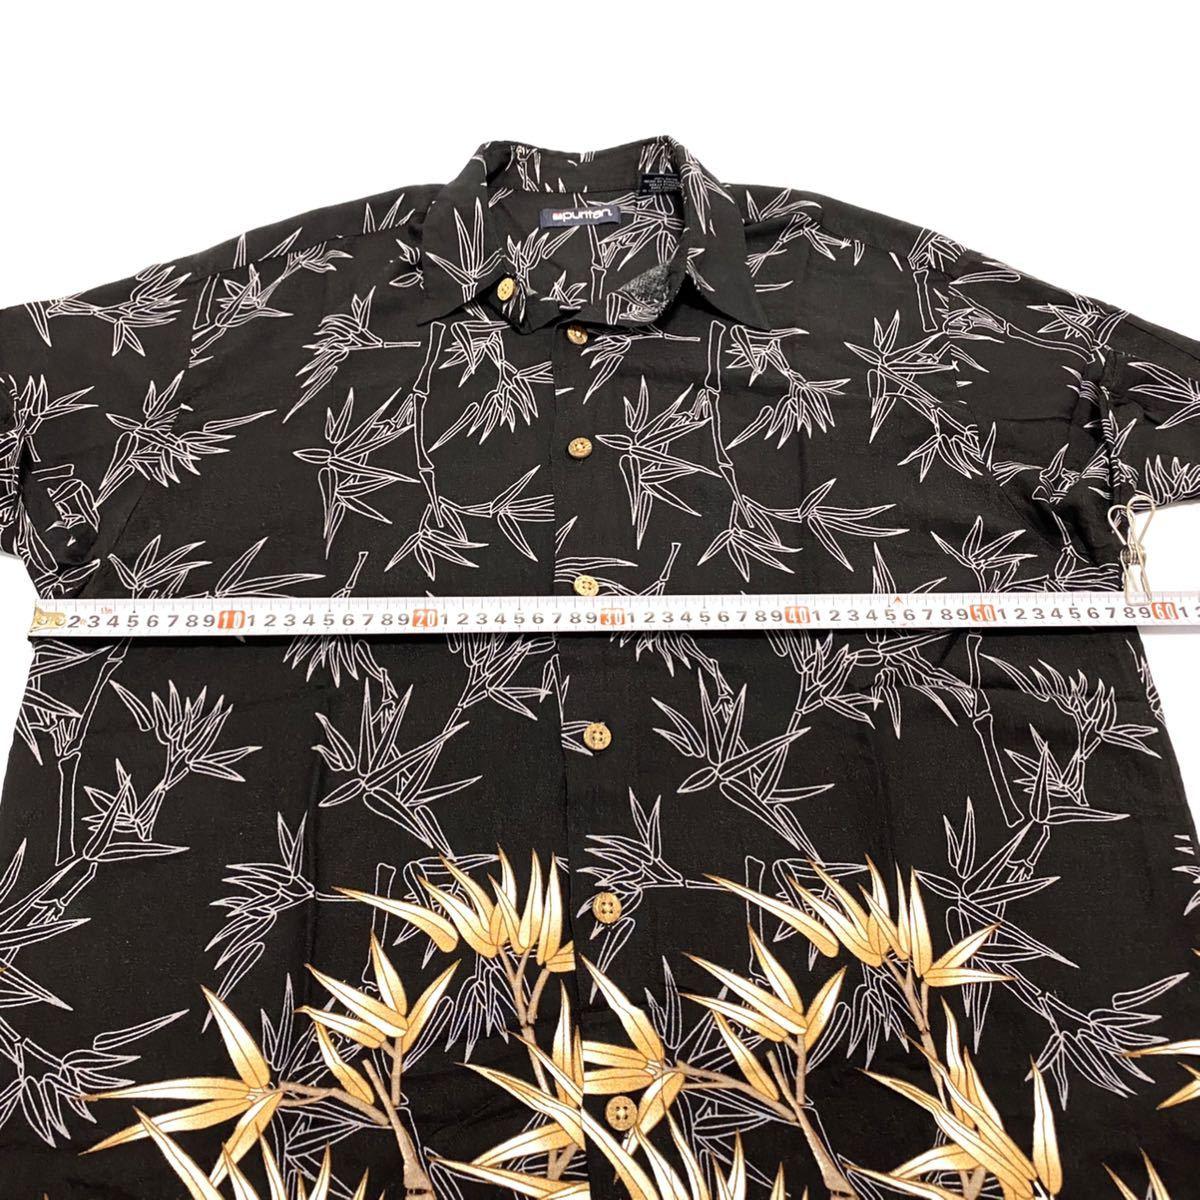 XL相当 ピューリタン 和柄 ブラック 黒 アロハシャツ メンズ 即決 柄シャツ アメリカ古着